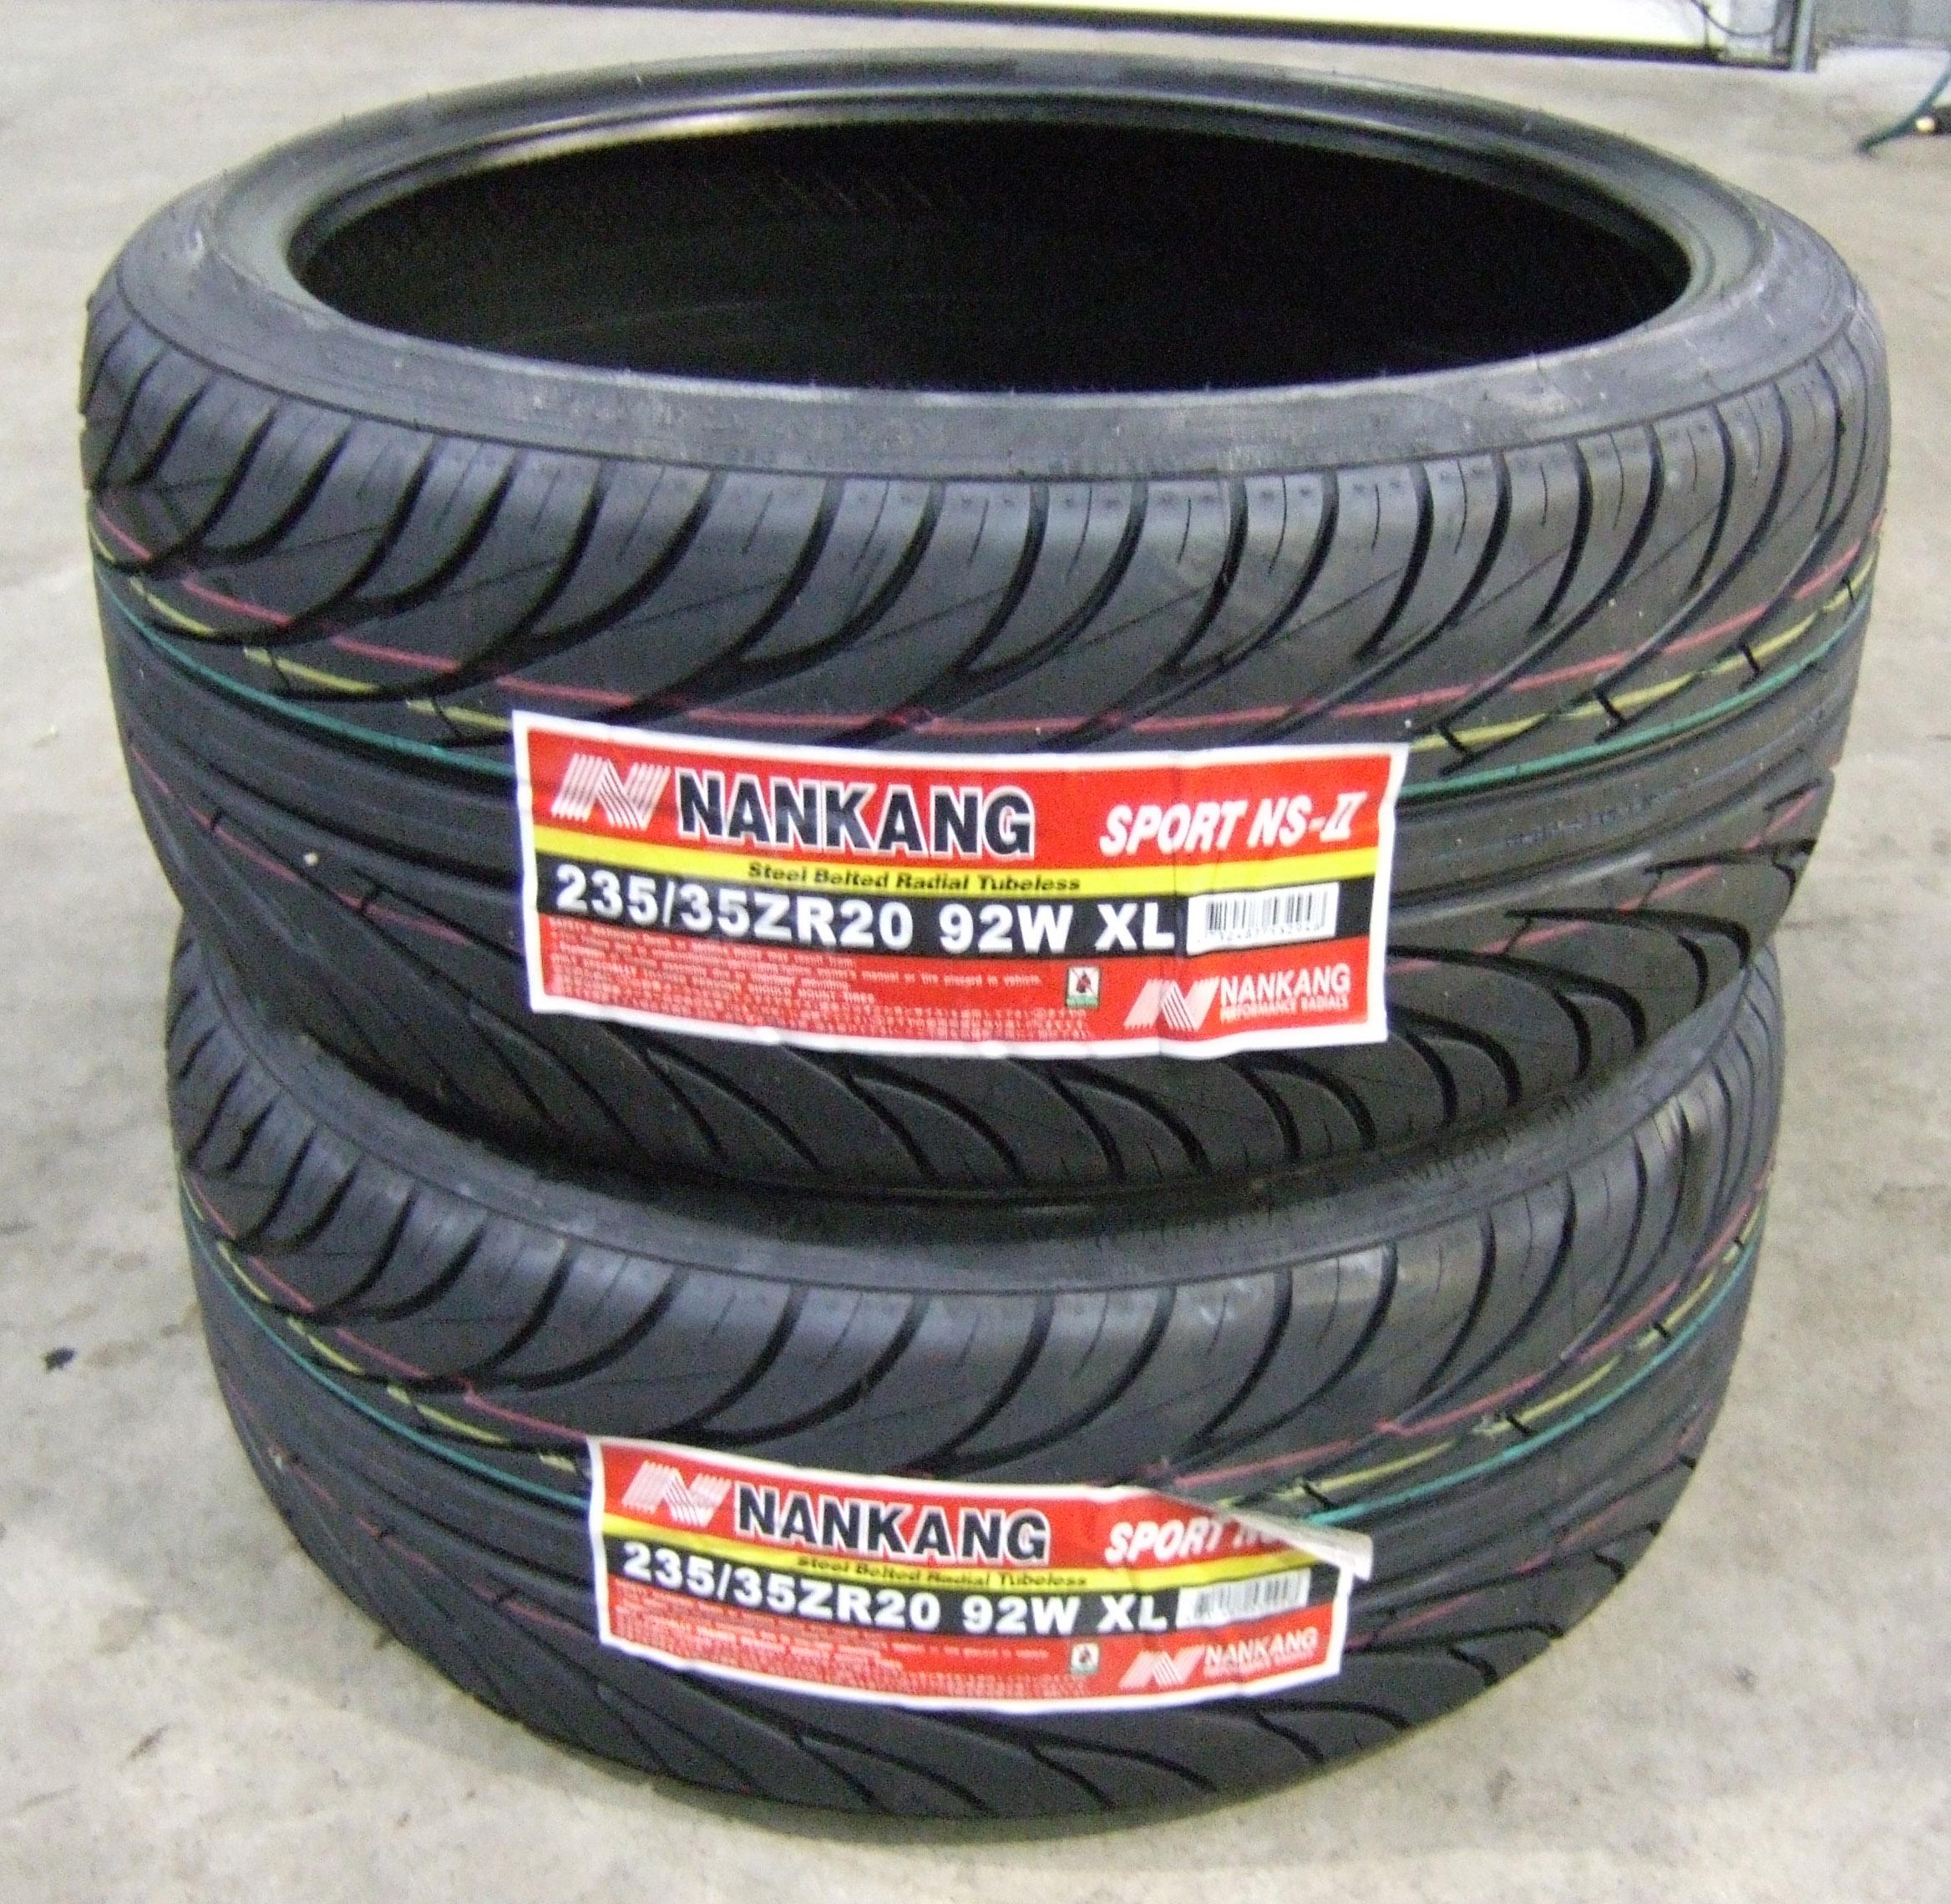 235 35 20 nankang sport ns2 tyres 2353520 92w xl 235 35 20. Black Bedroom Furniture Sets. Home Design Ideas